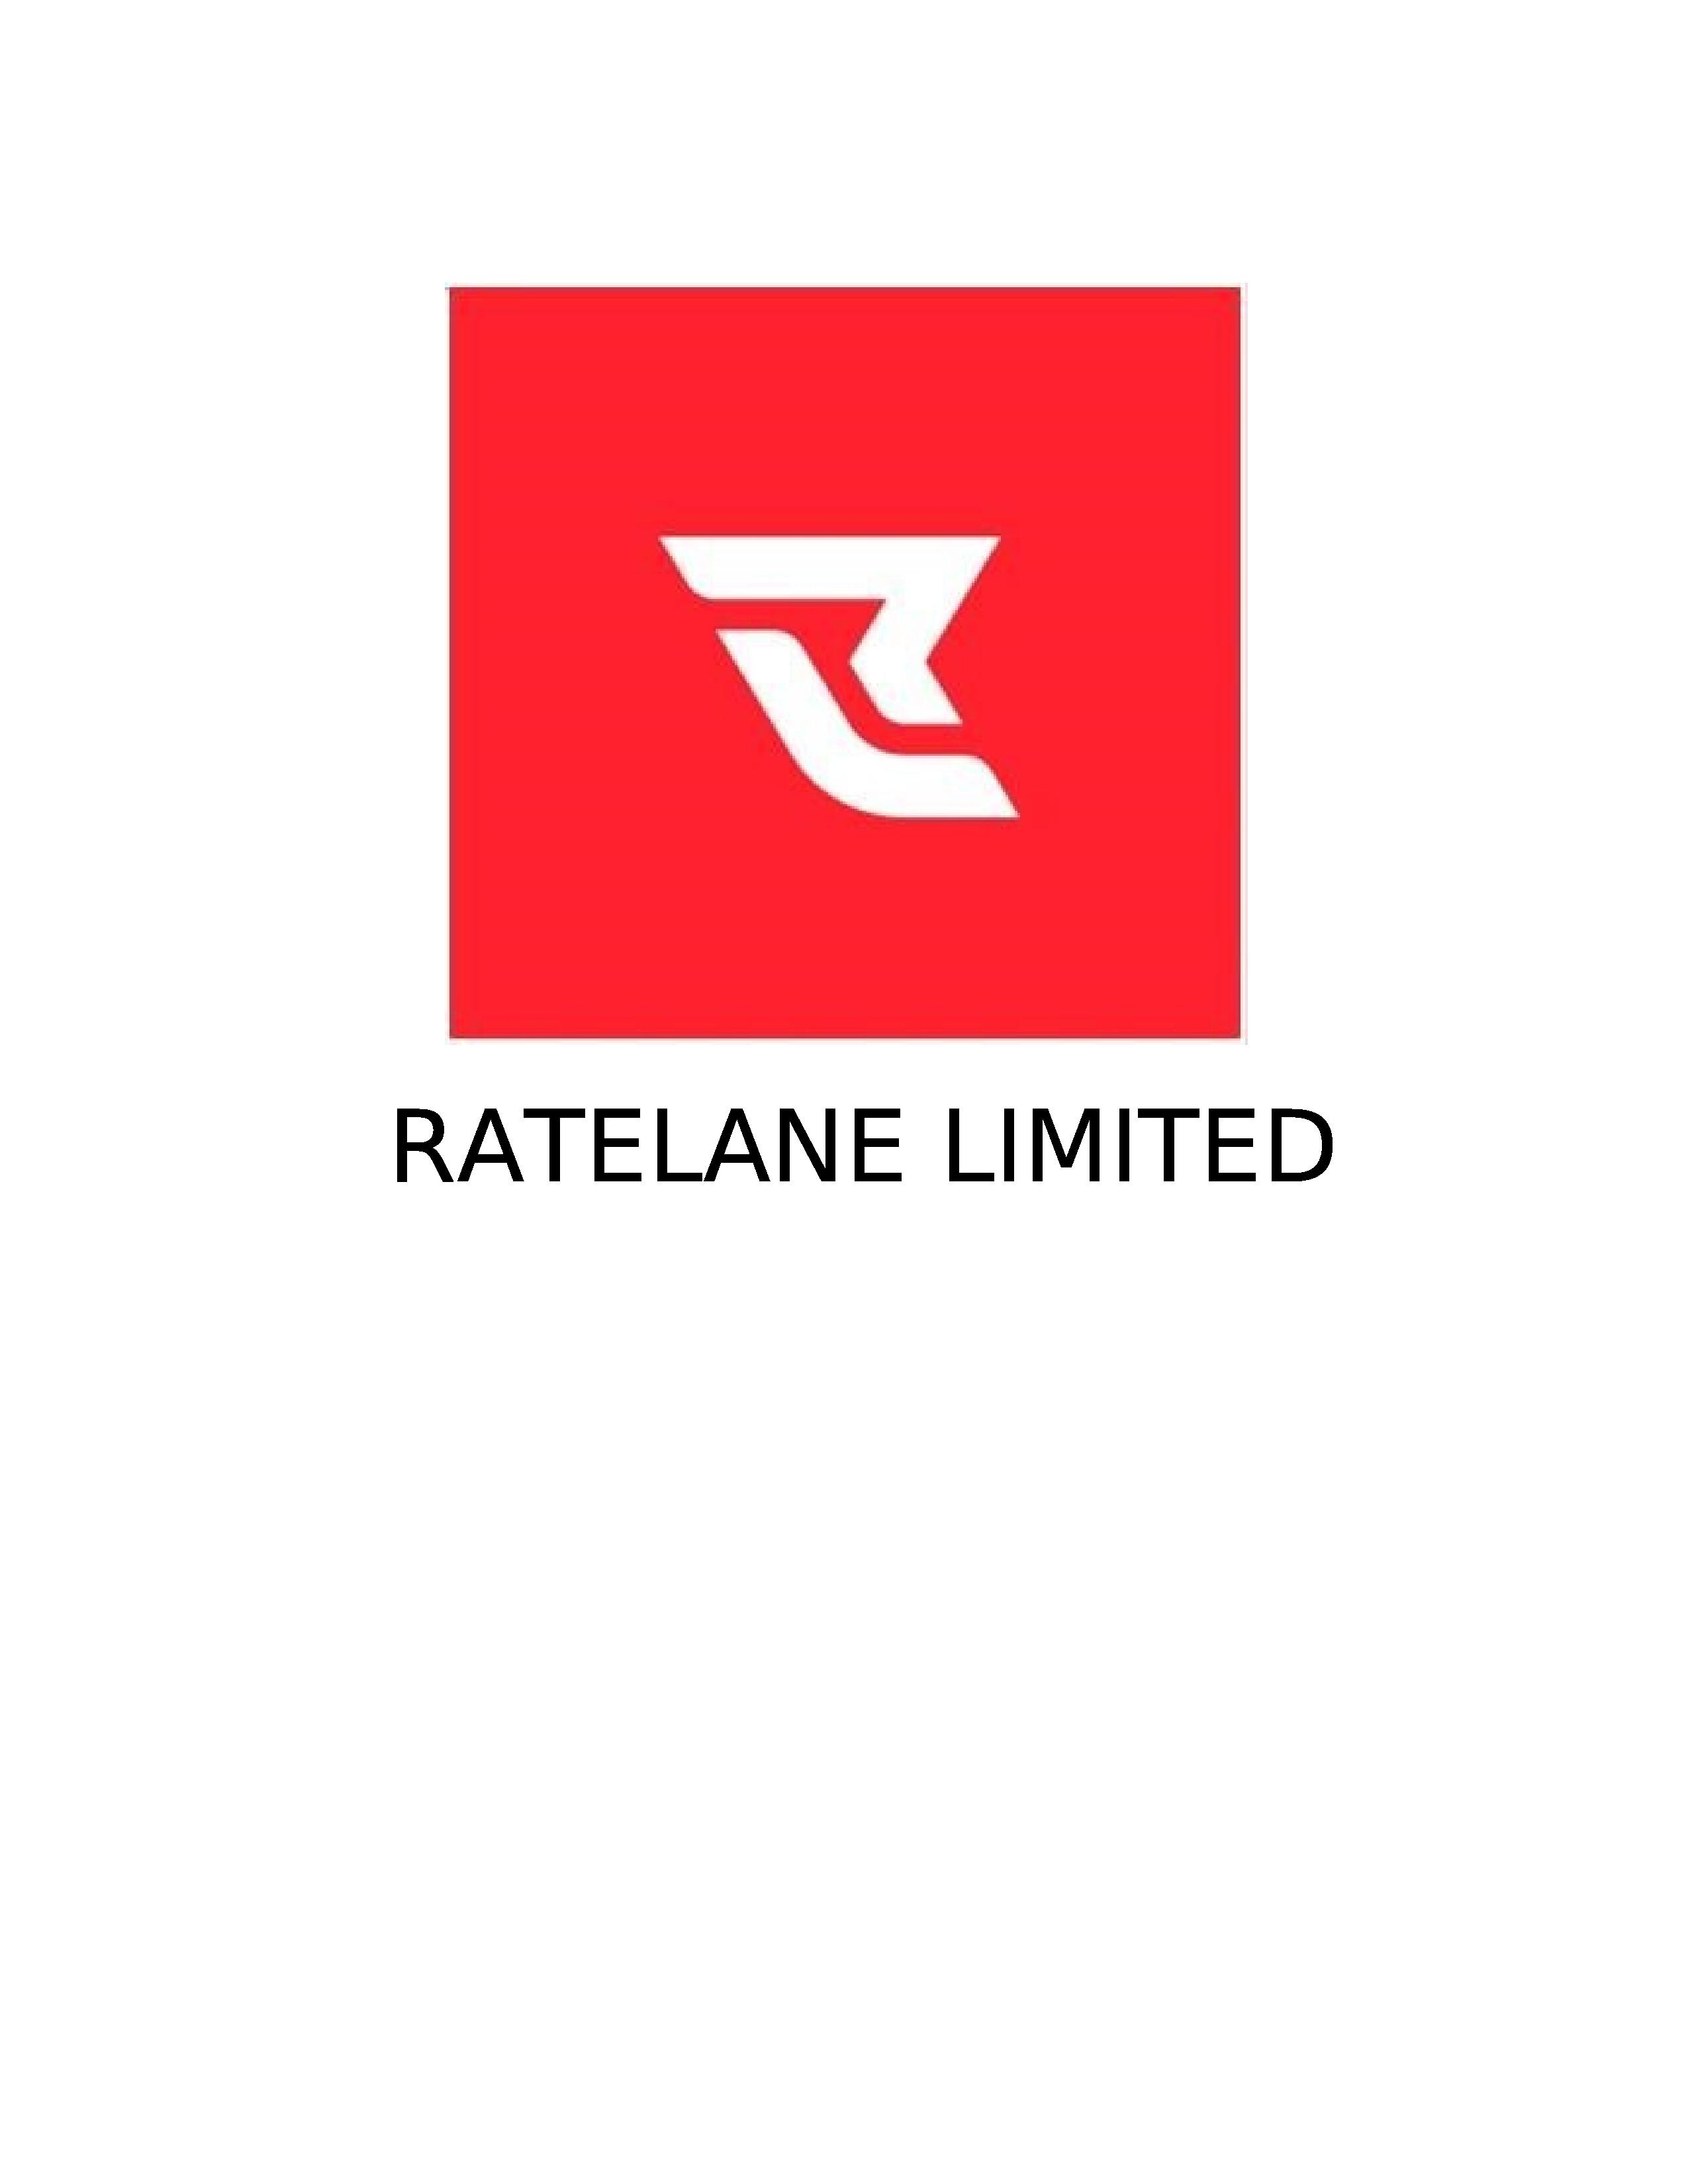 LOGO RATELANE_01